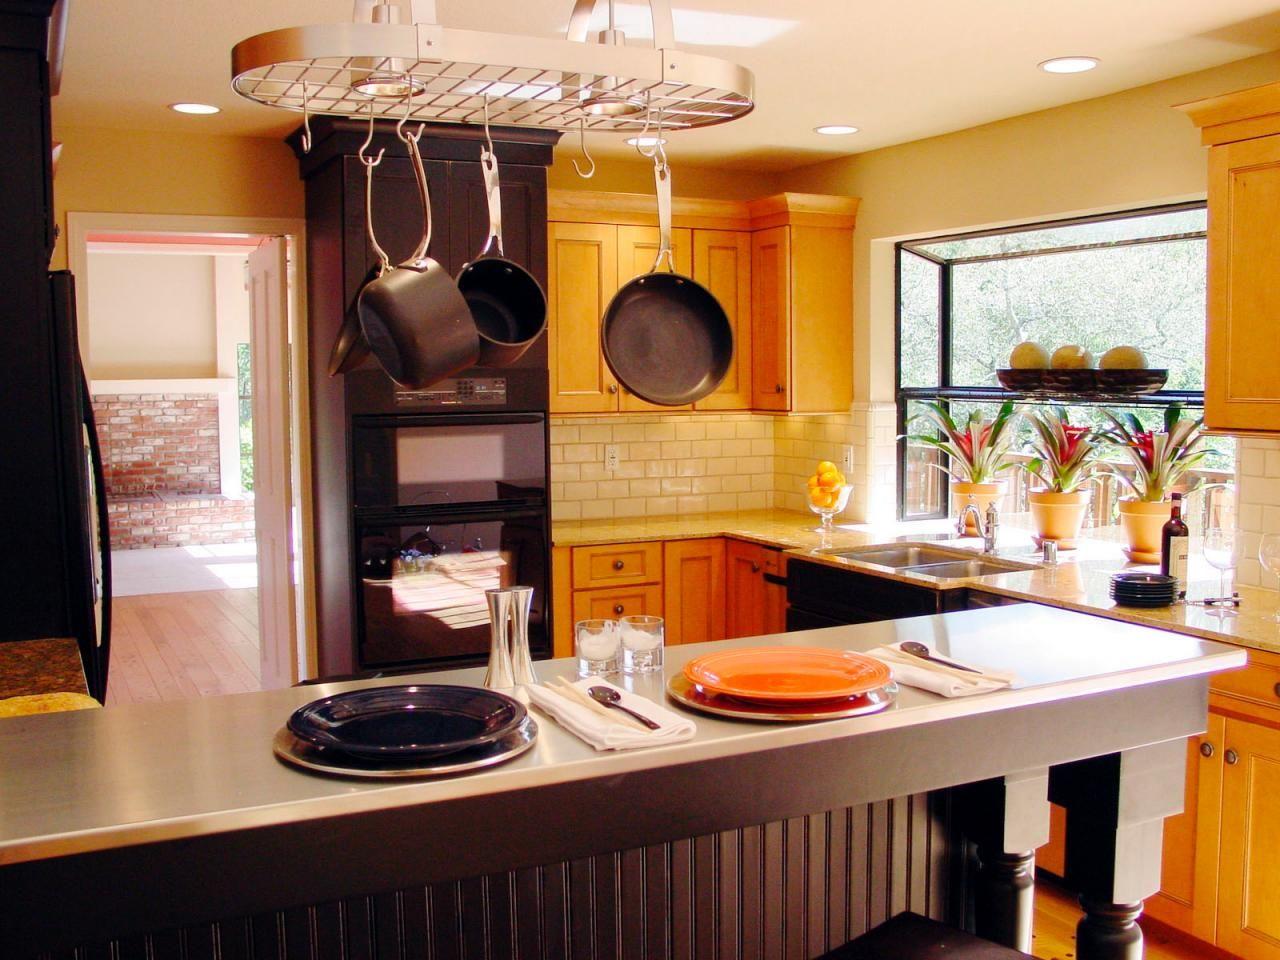 Yellow And Orange Kitchen Ideas Part - 35: Kitchen Ideas: Design Styles And Layout Options